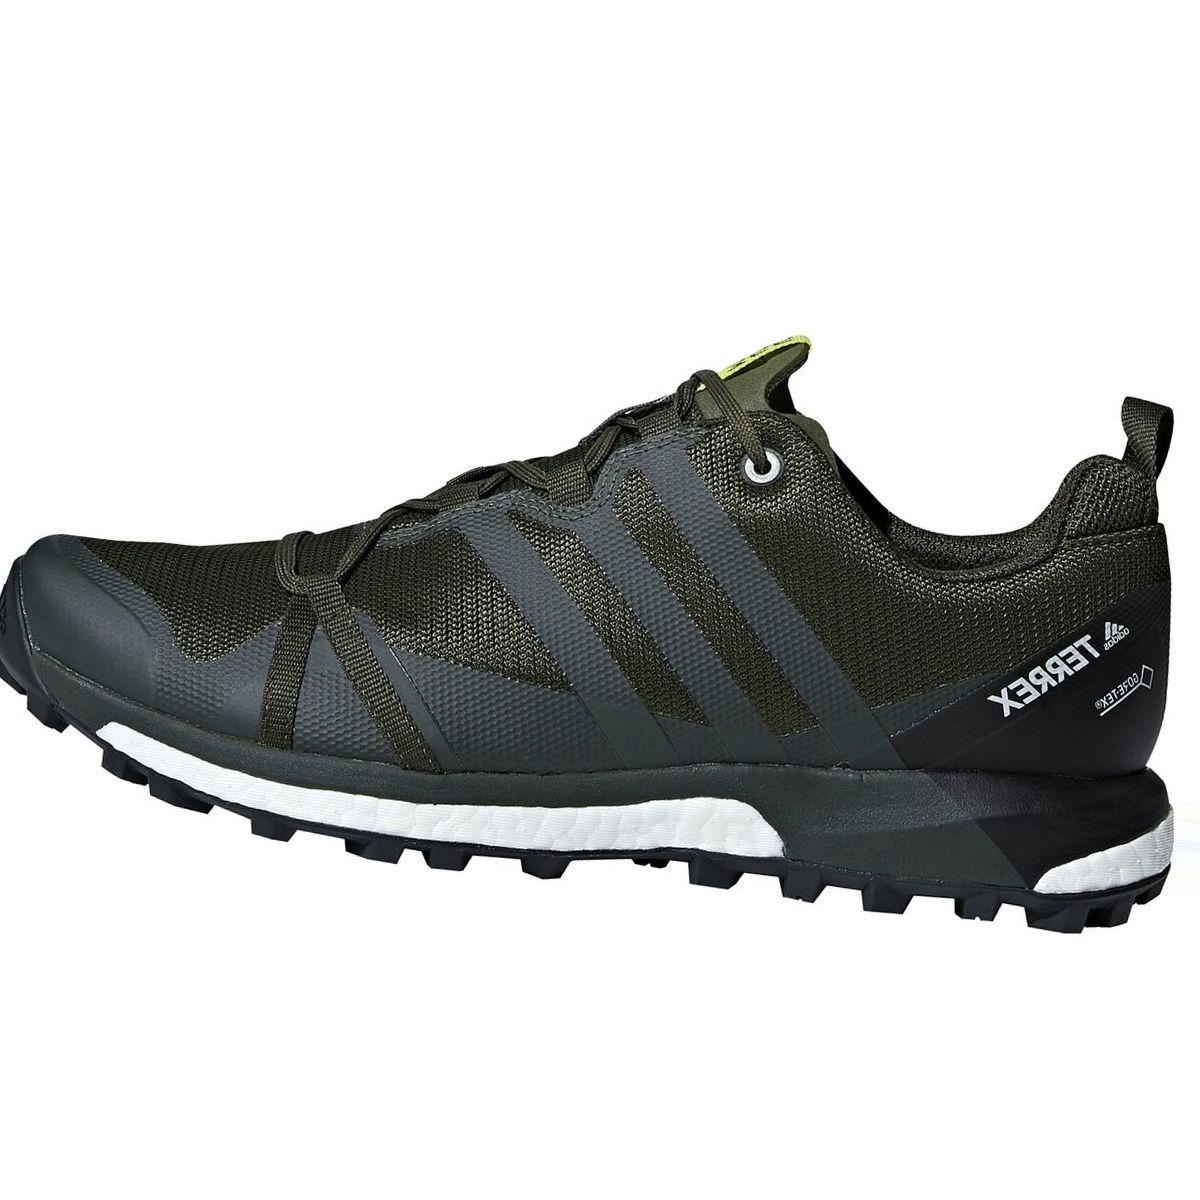 Adidas Outdoor Terrex Agravic GTX Shoe - Men's